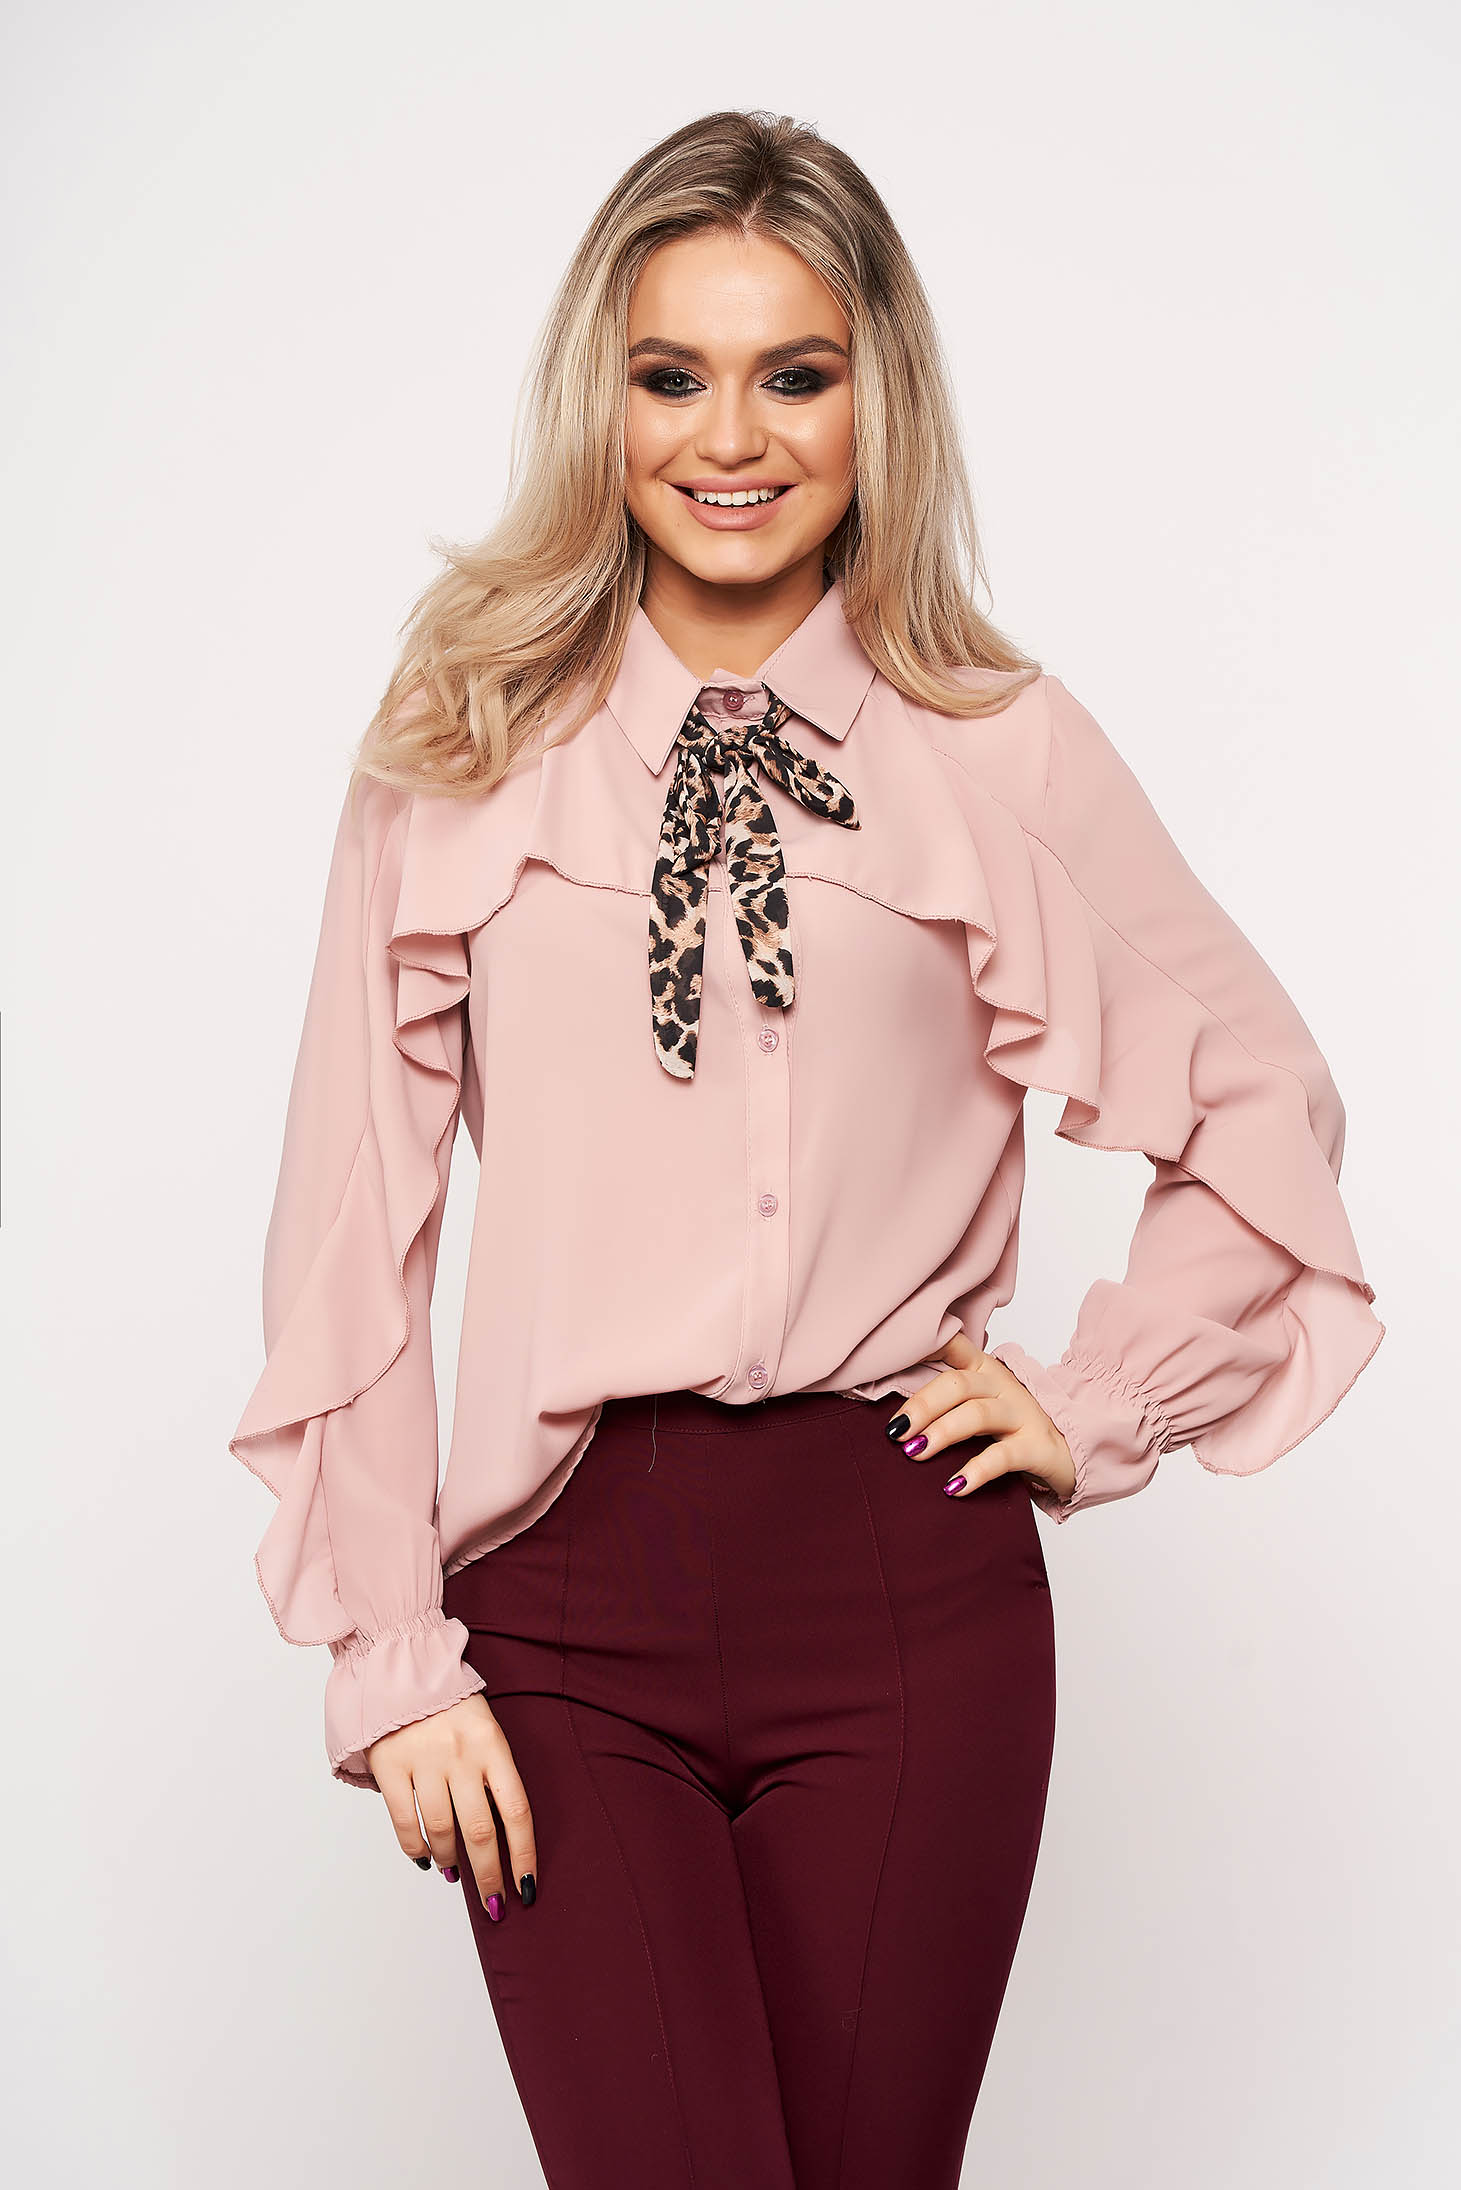 Lightpink women`s shirt bow accessory office animal print